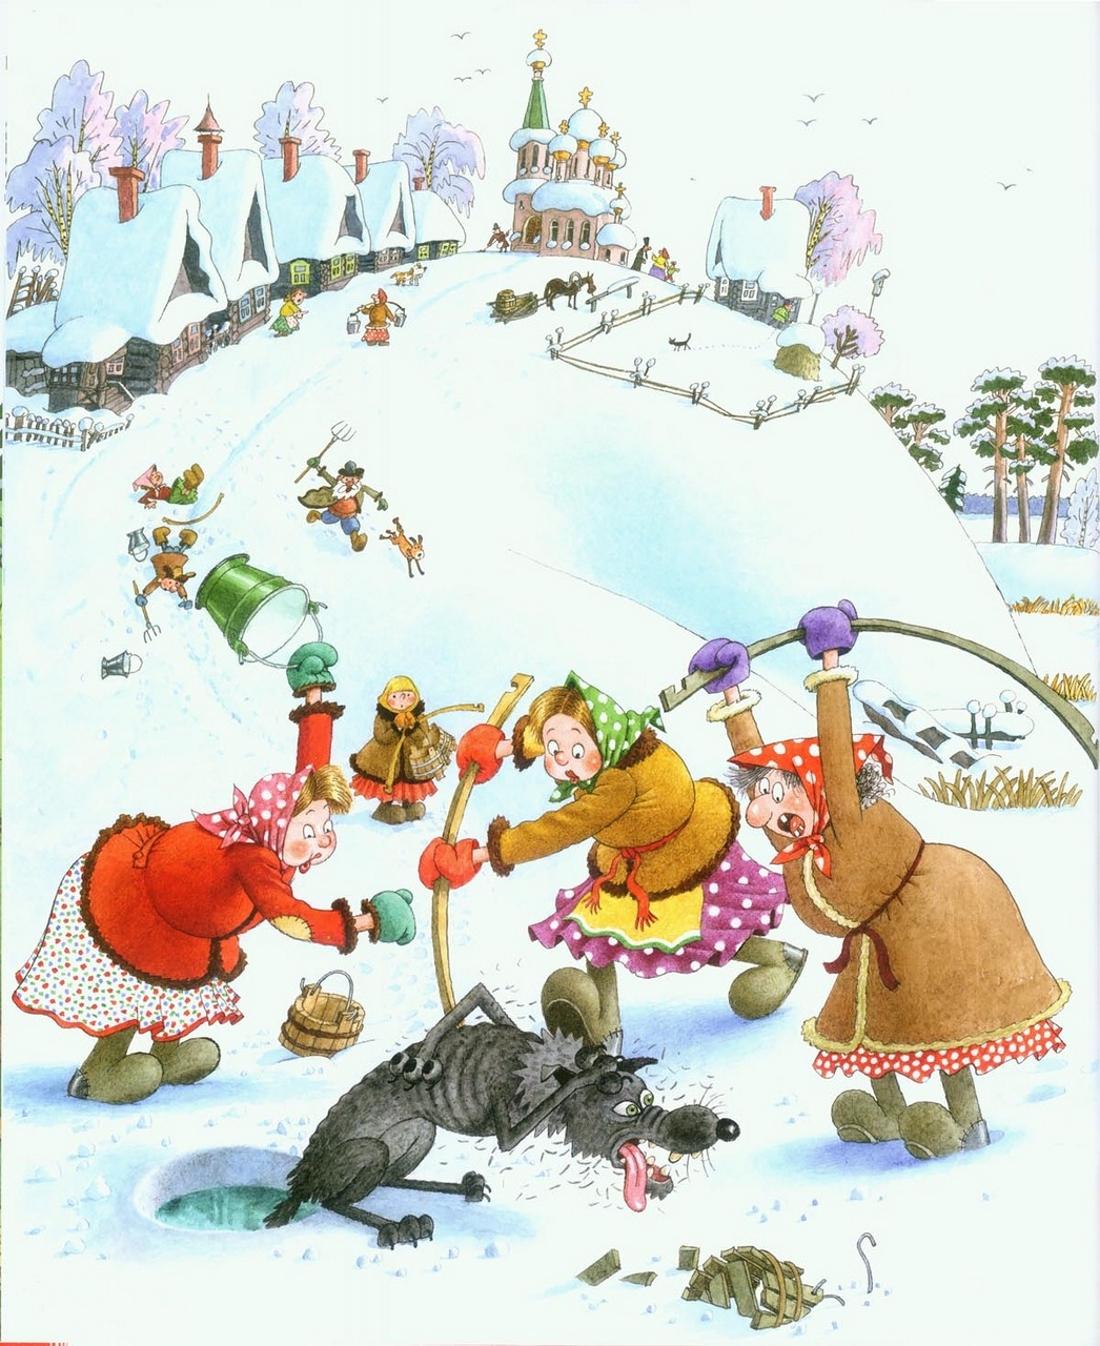 Рисунок сказки Лиса и Волк - картинка №12769 | Printonic.ru